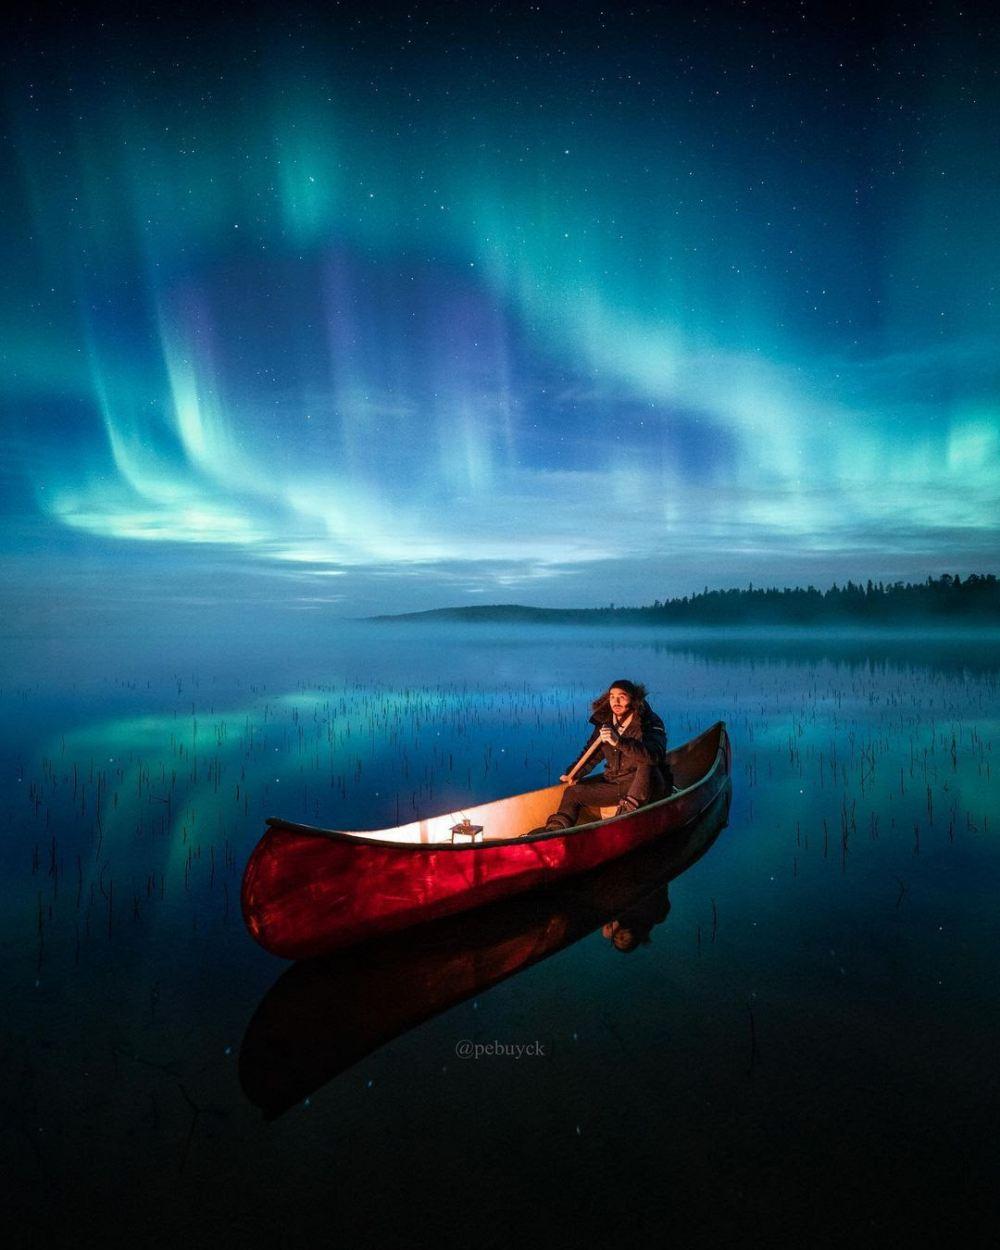 the lonely boat and the northern lights - 带上你最爱的人到芬兰Rovaniemi看浪漫的北极光!